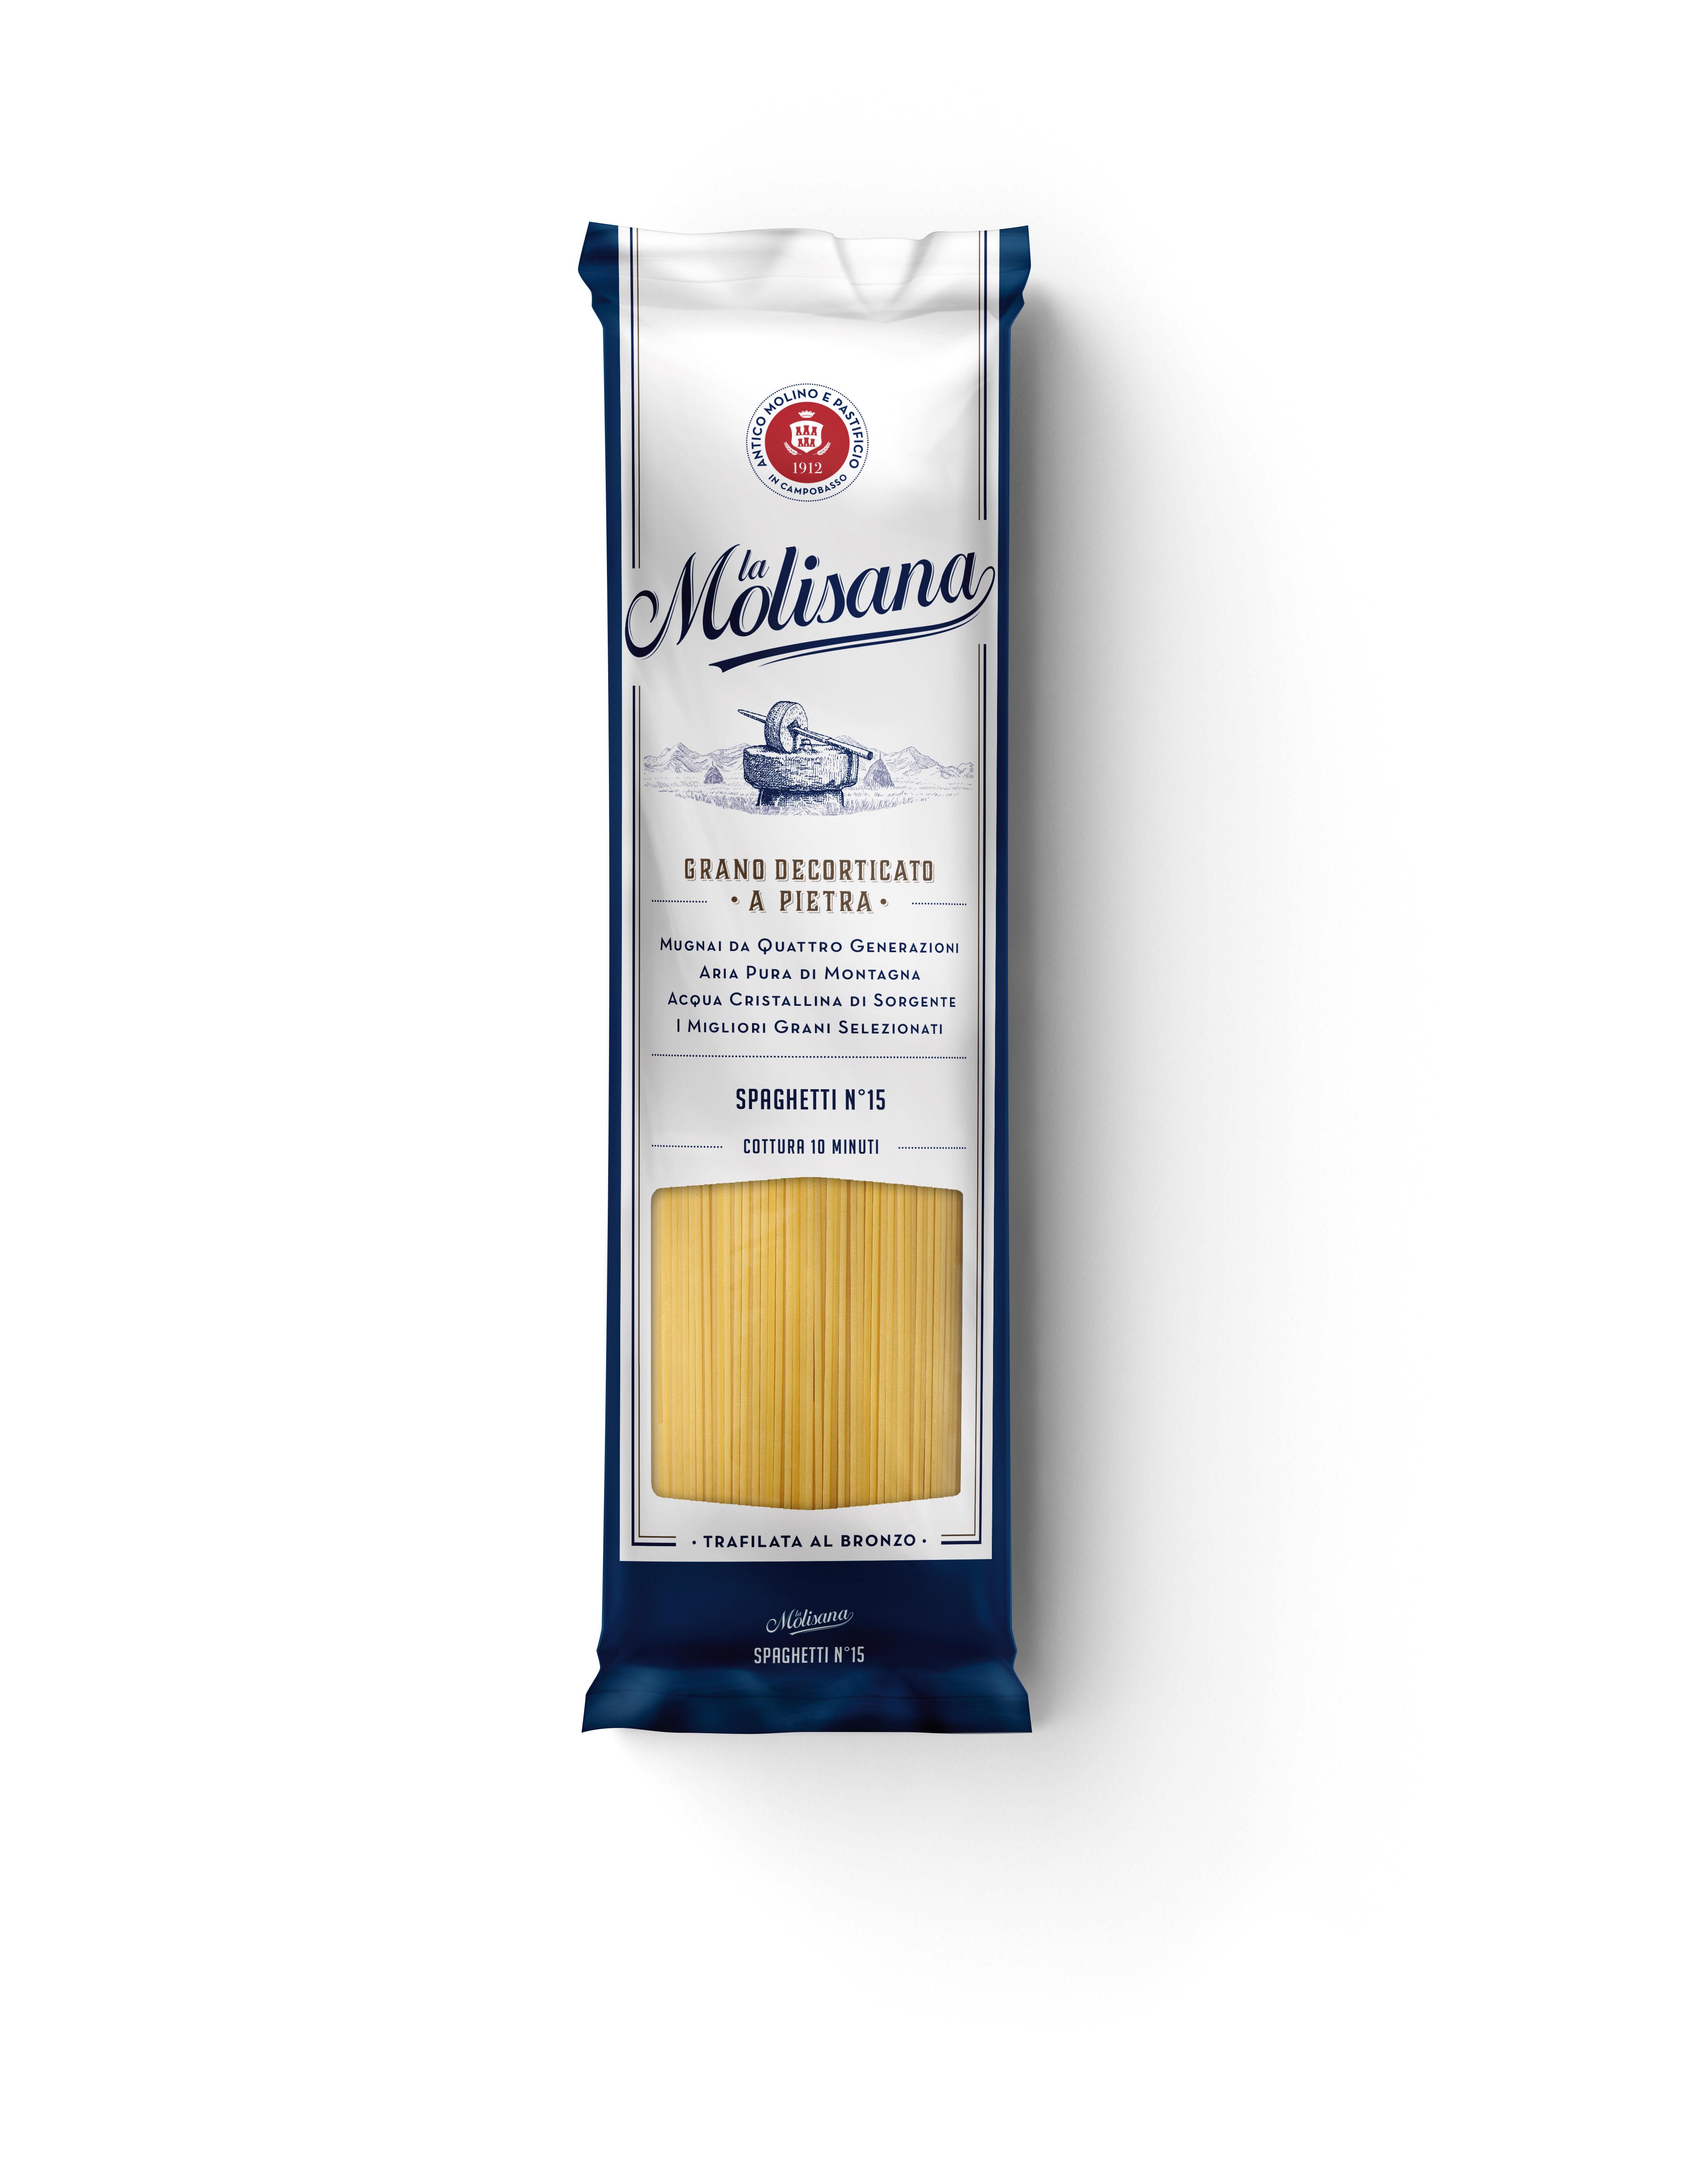 Spaghetti bronzo 500g La Molisana